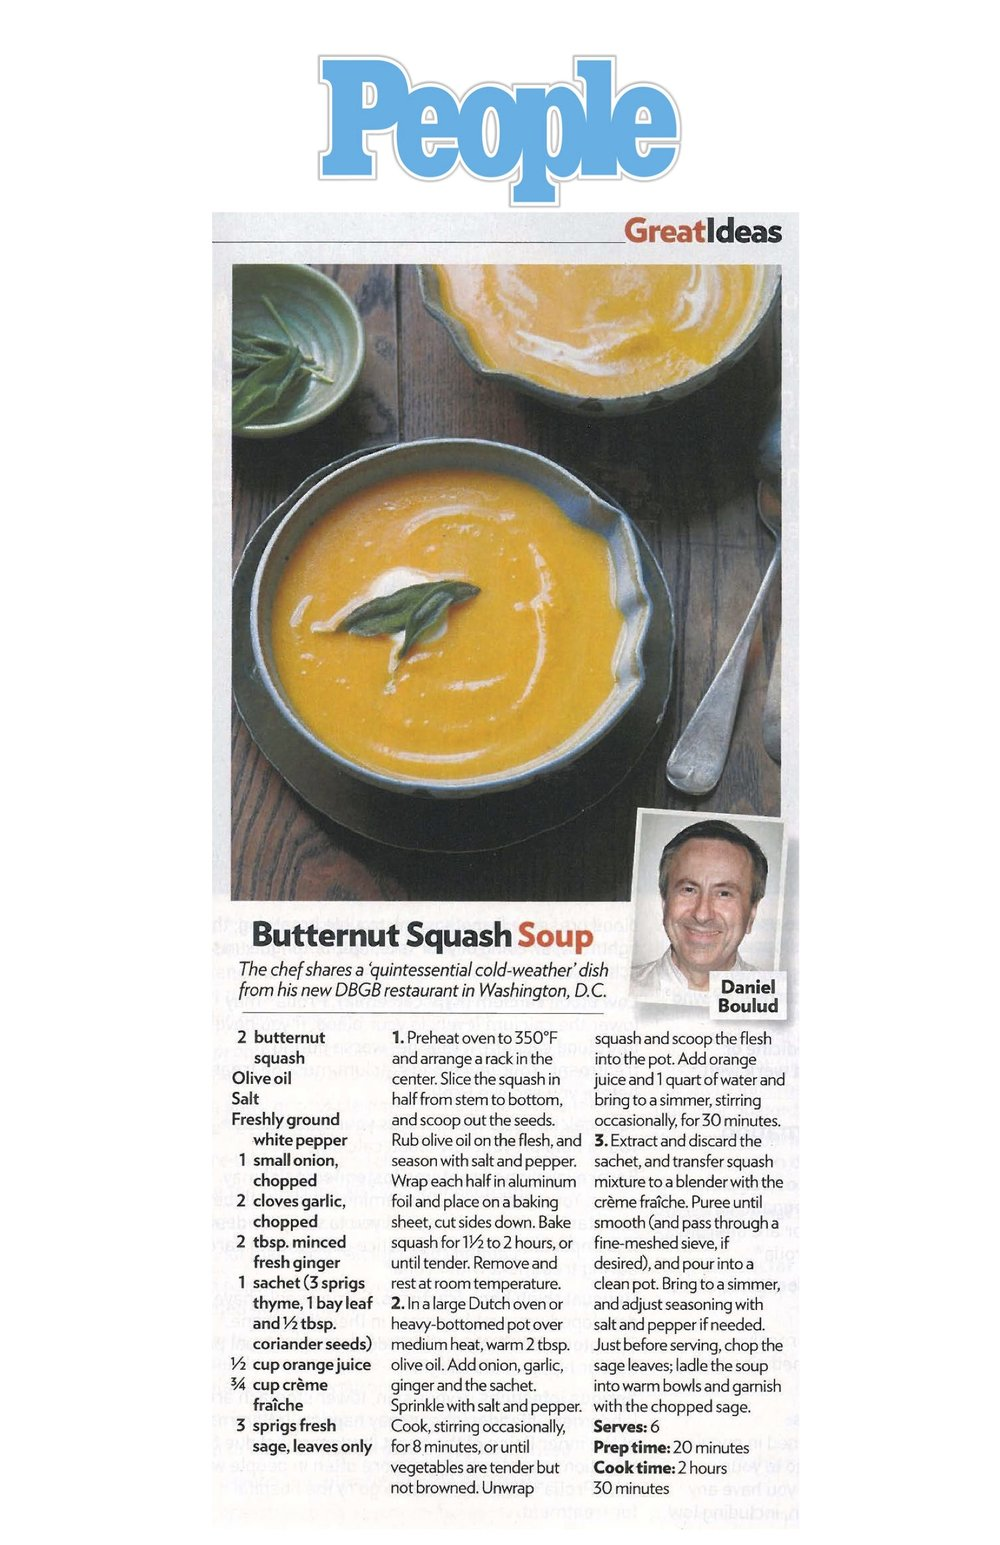 DBGB DC_People_Butternut Squash Soup_Dec 29 2014.jpg